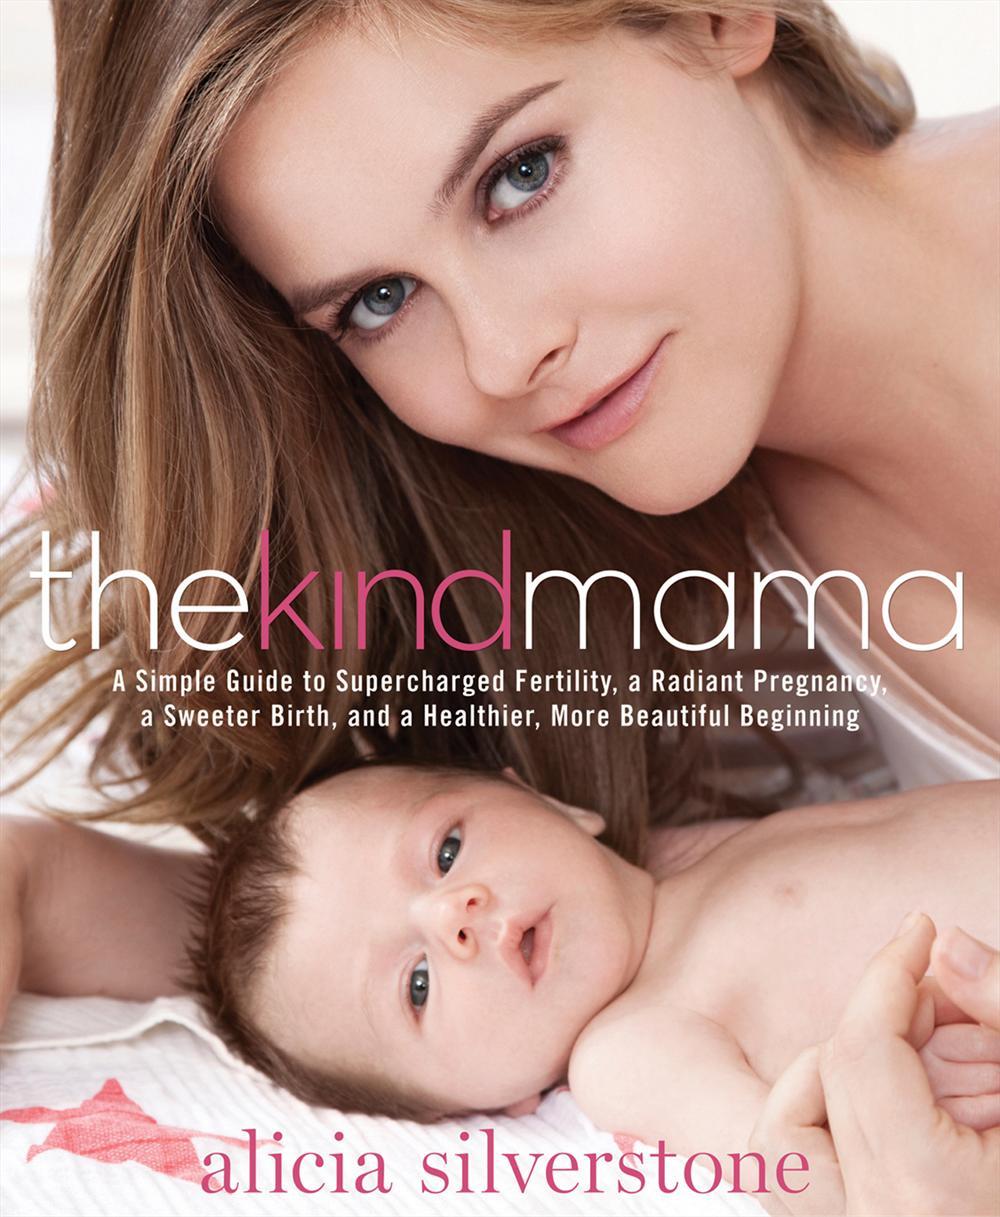 The Kind Mama book trailer